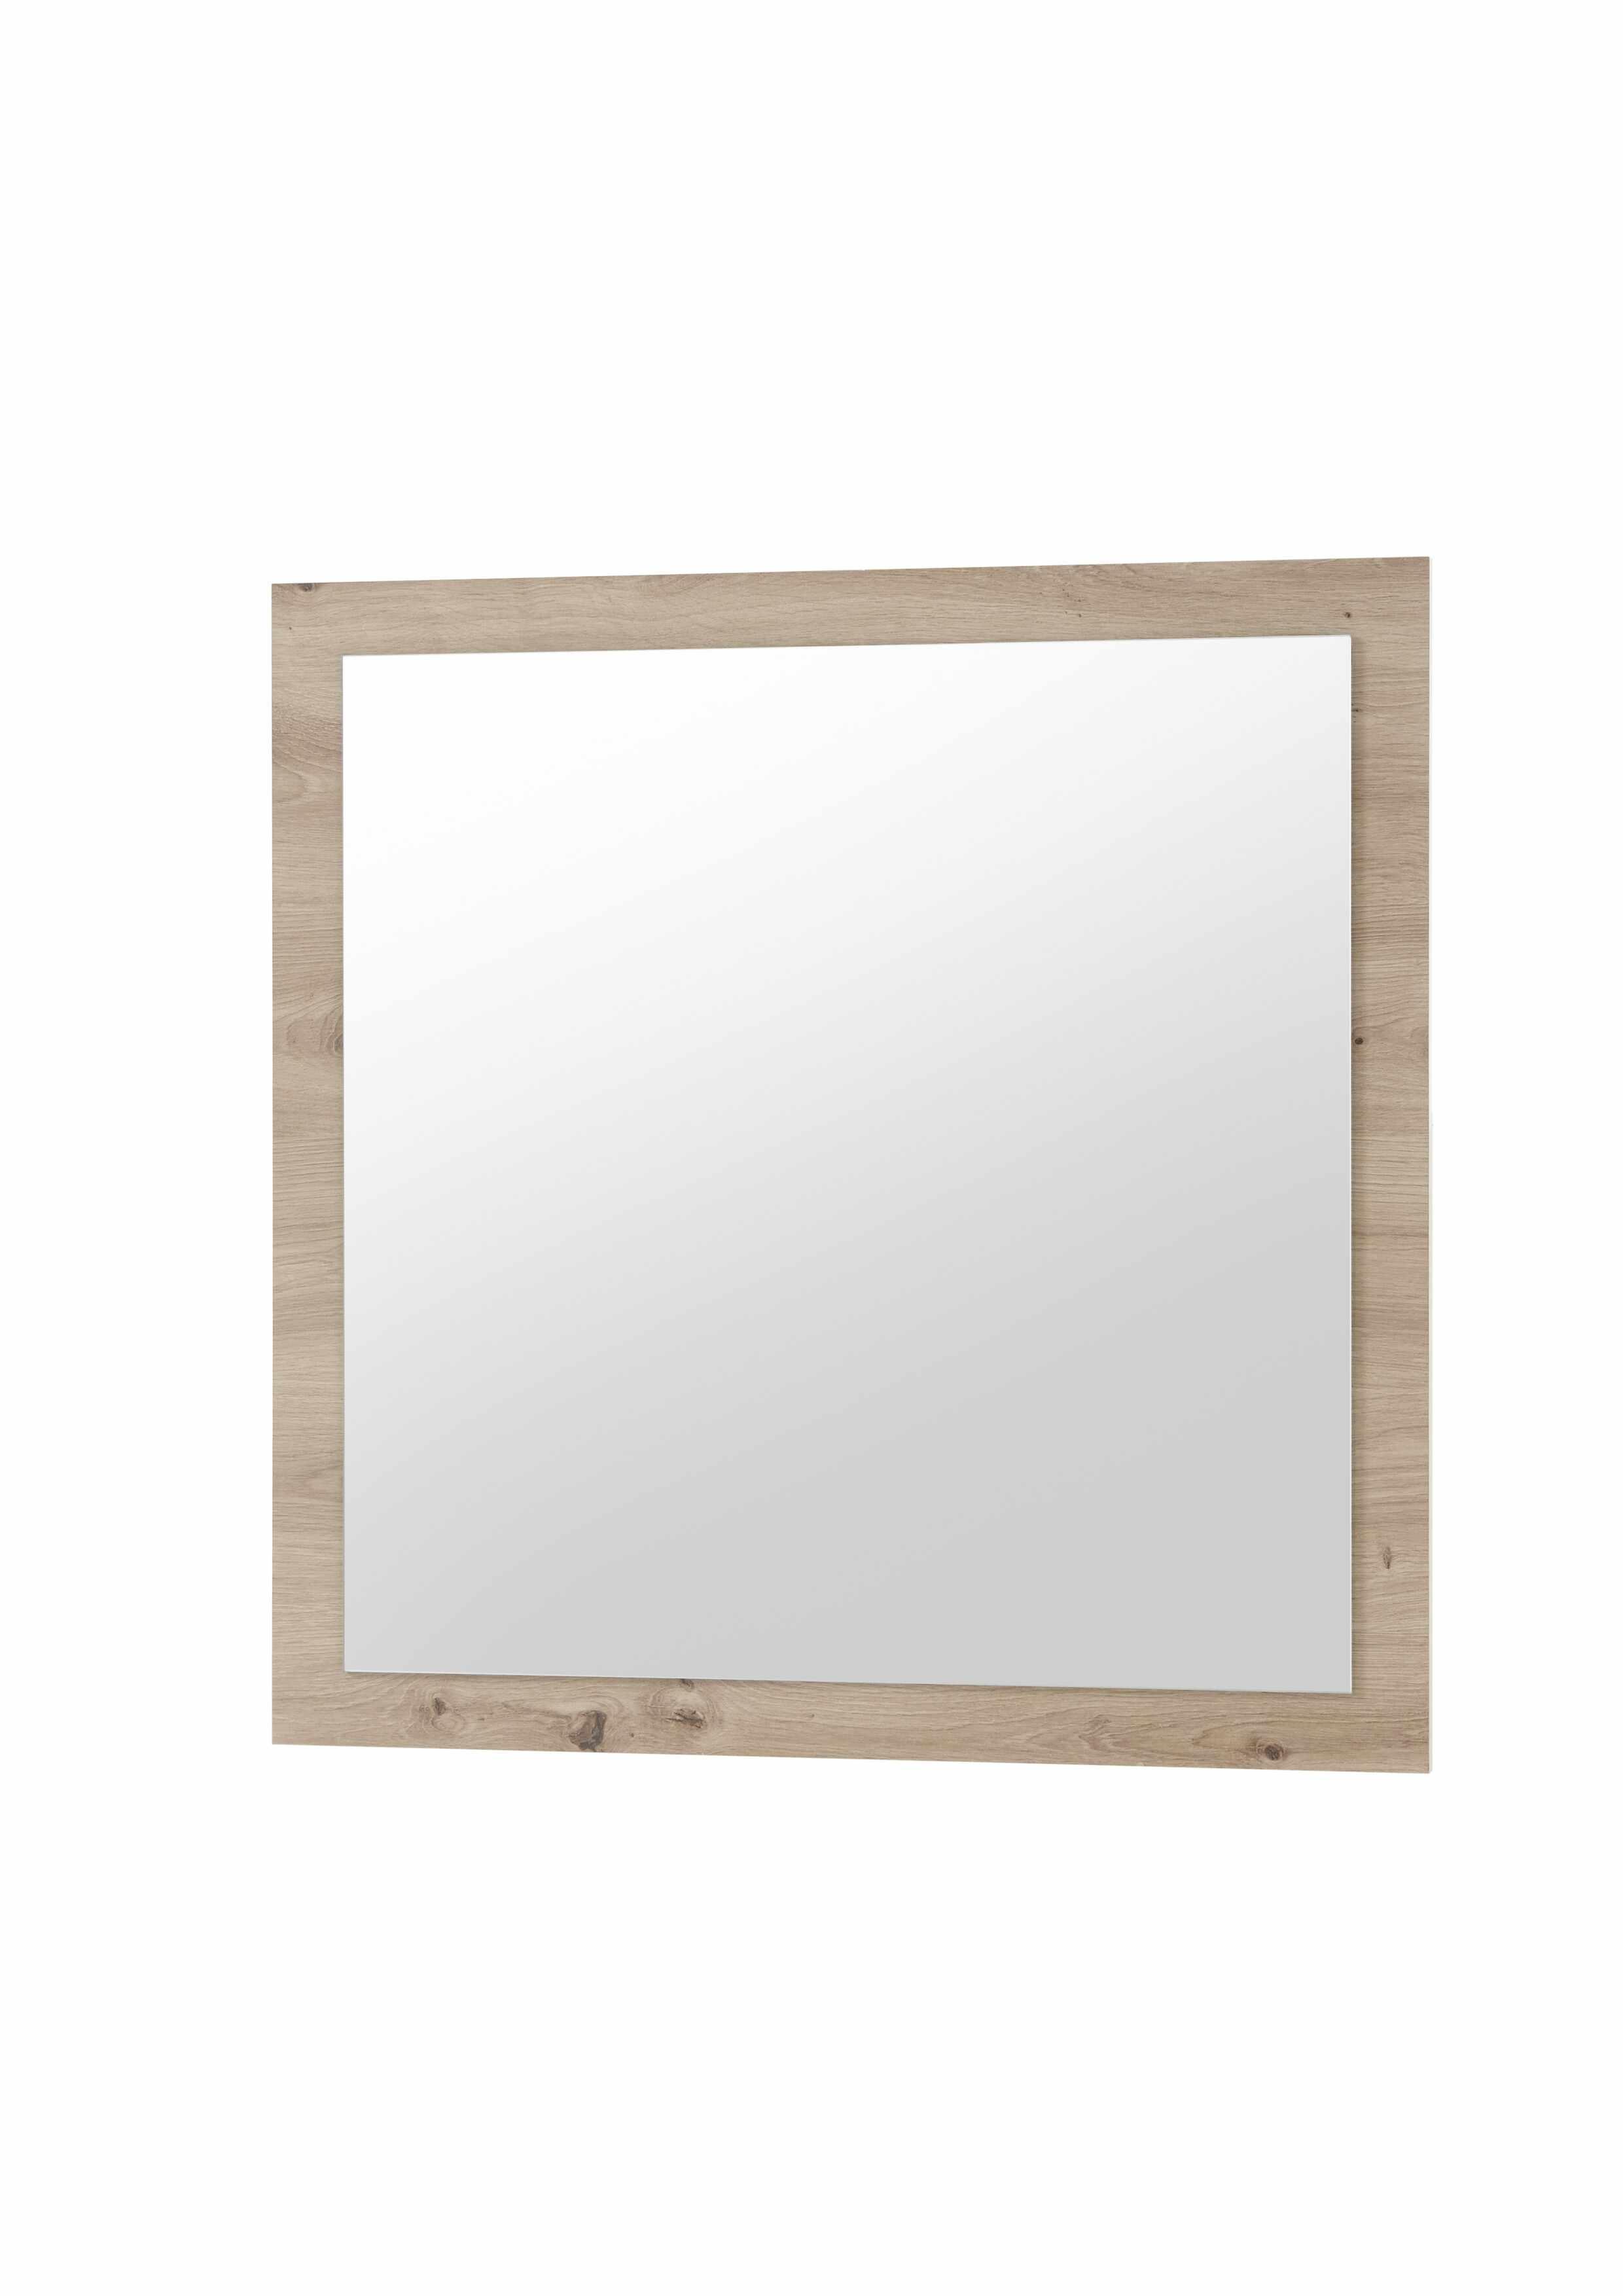 Oglinda decorativa din pal, Gota Natural, l78xA2xH78 cm la pret 216 lei